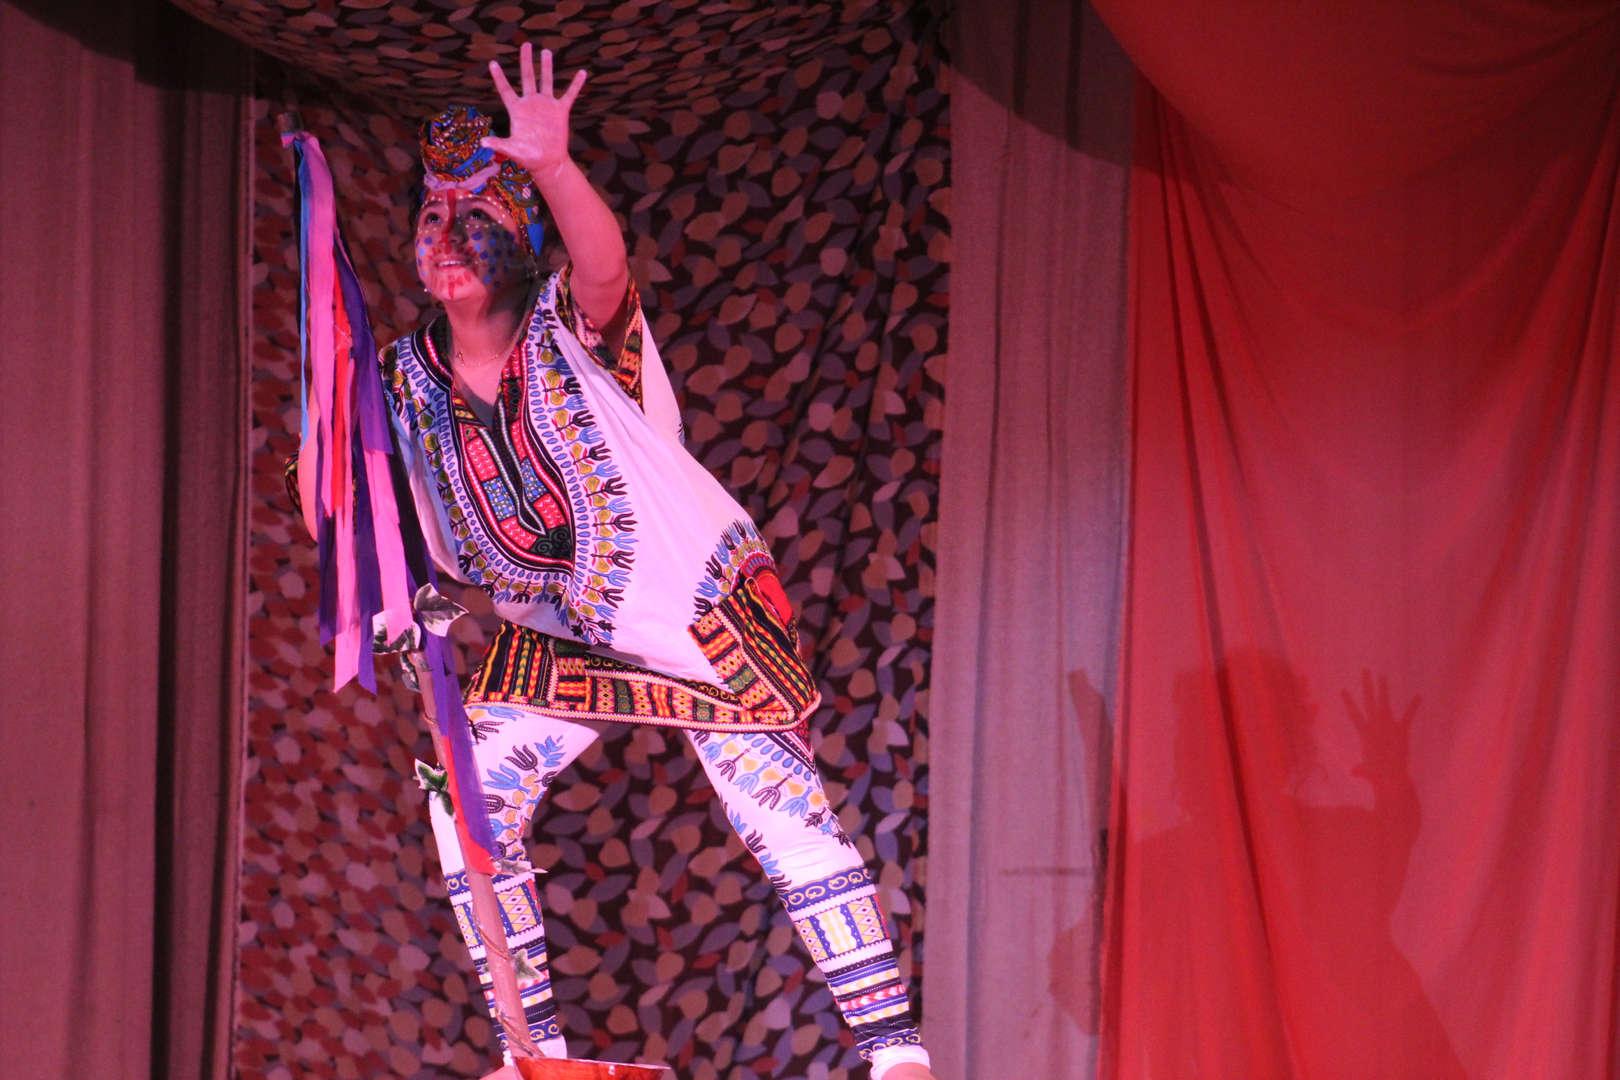 Actor reaching hands up